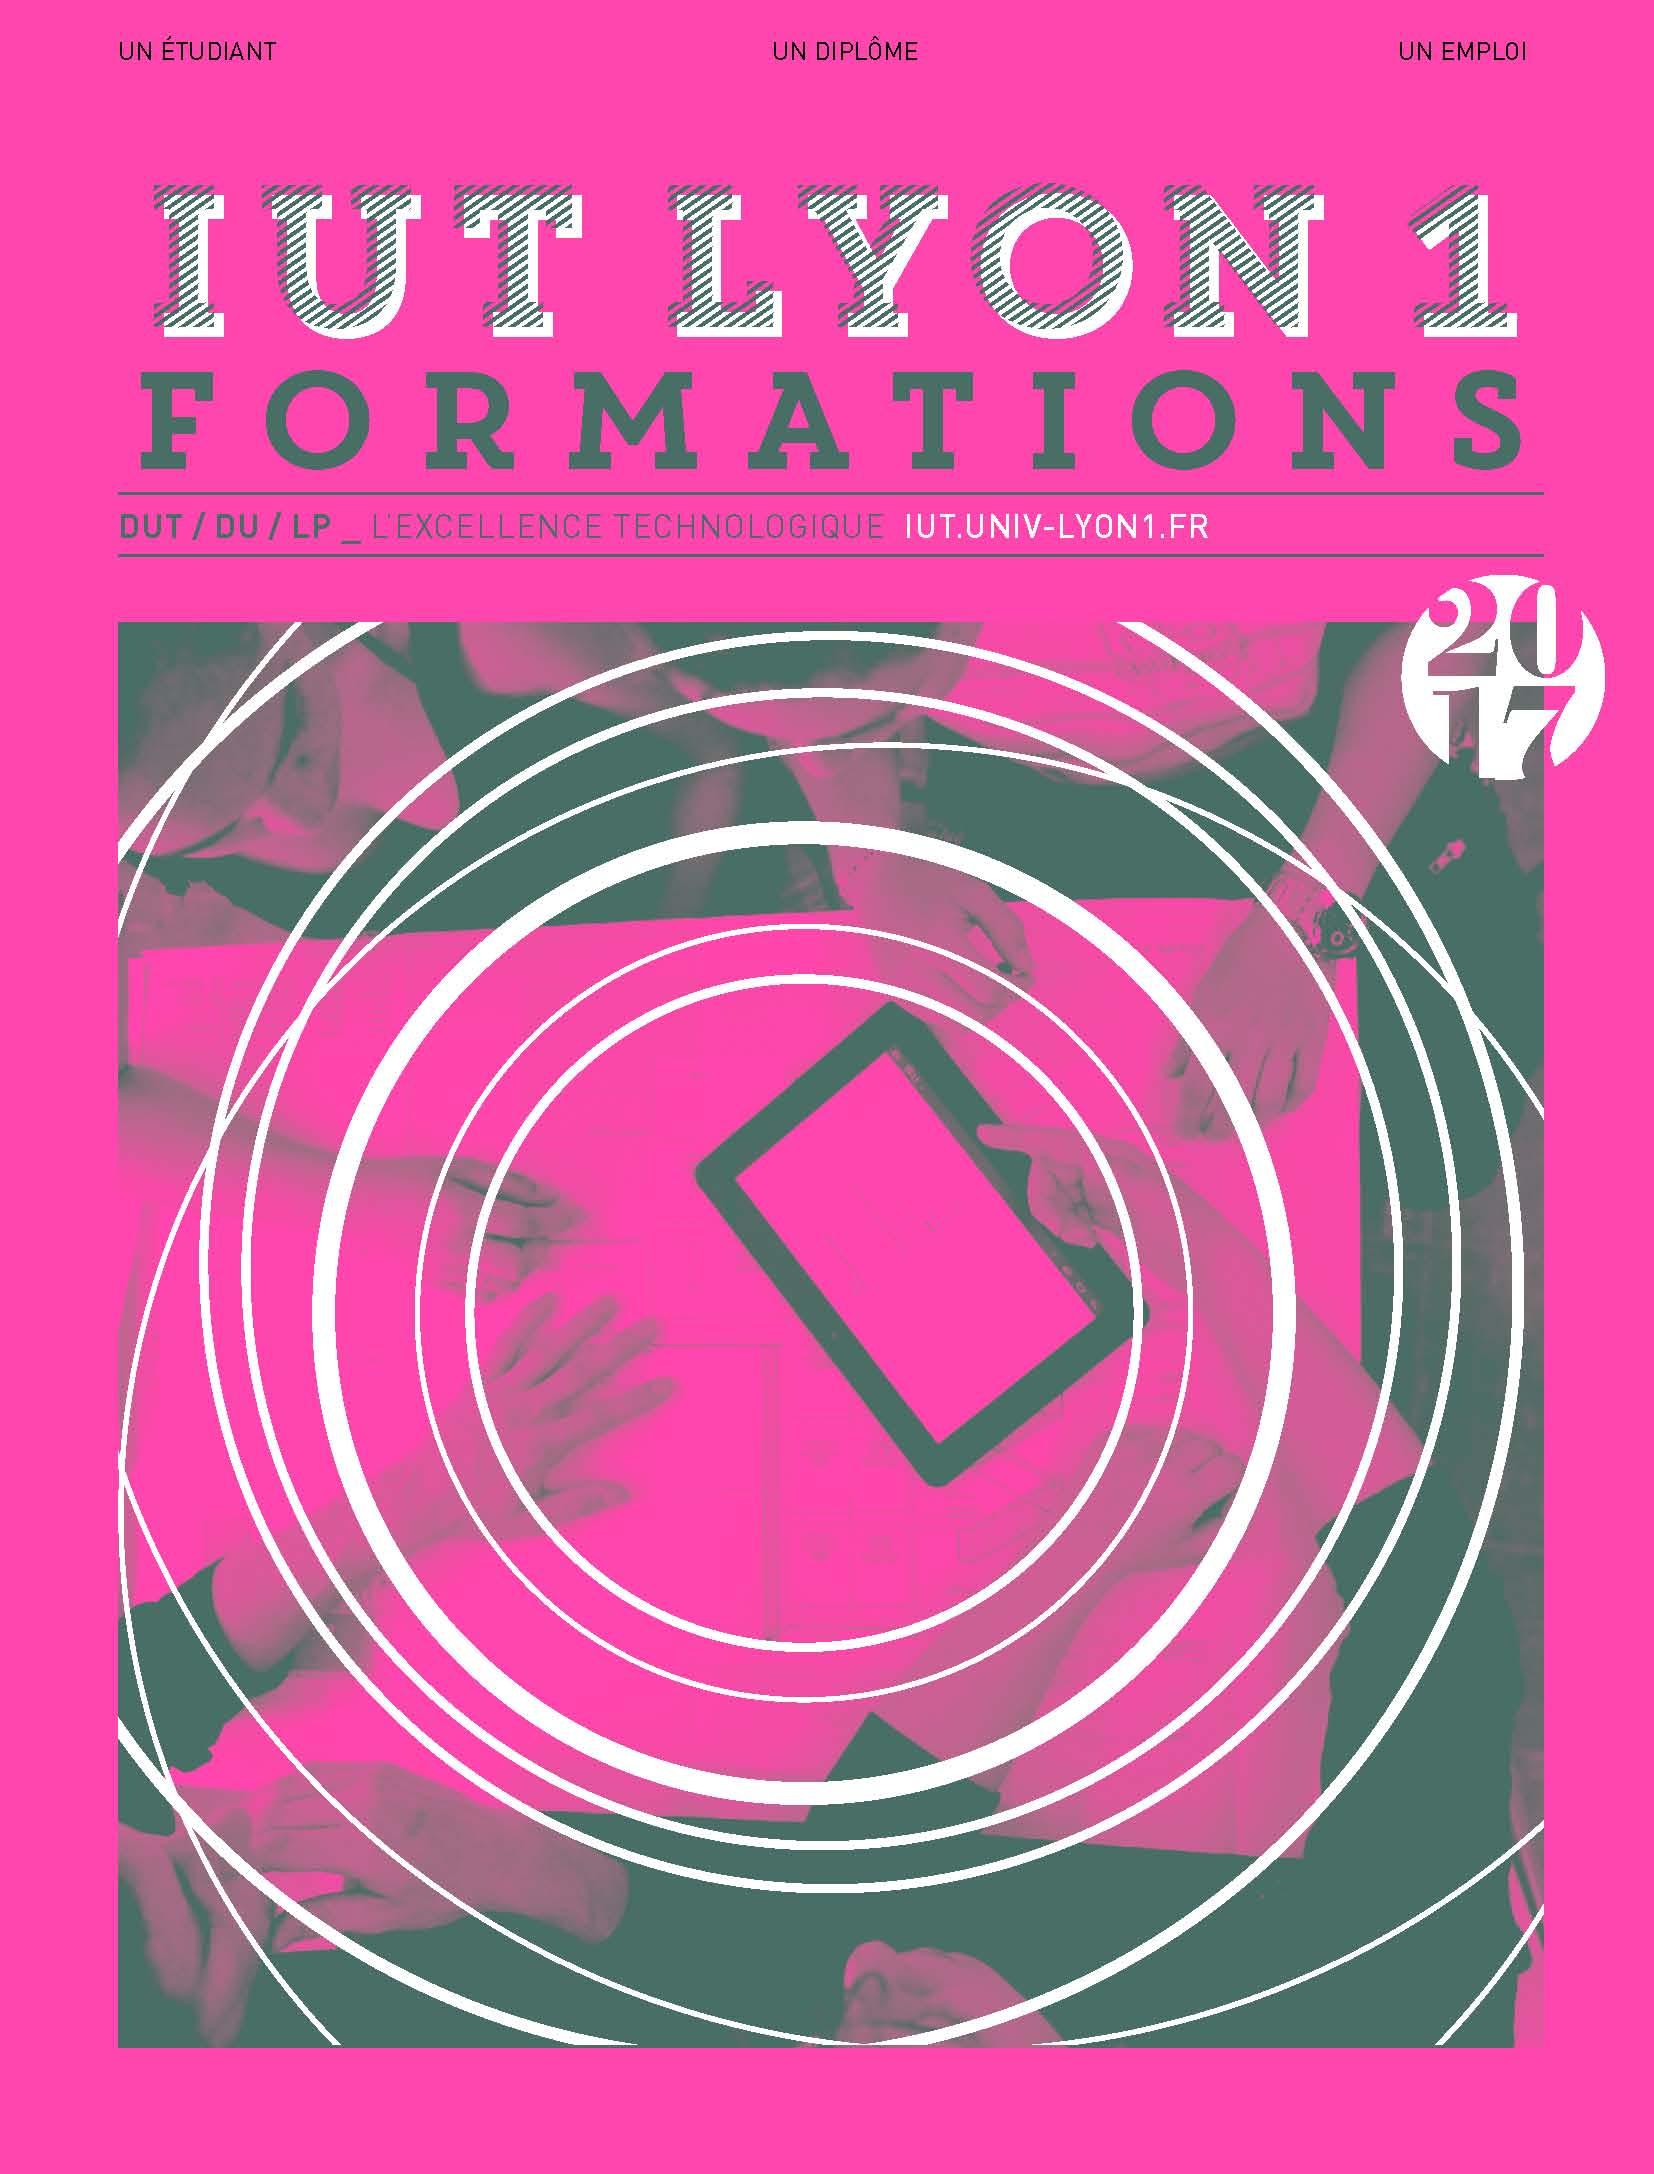 Couverture Catalogue Formations